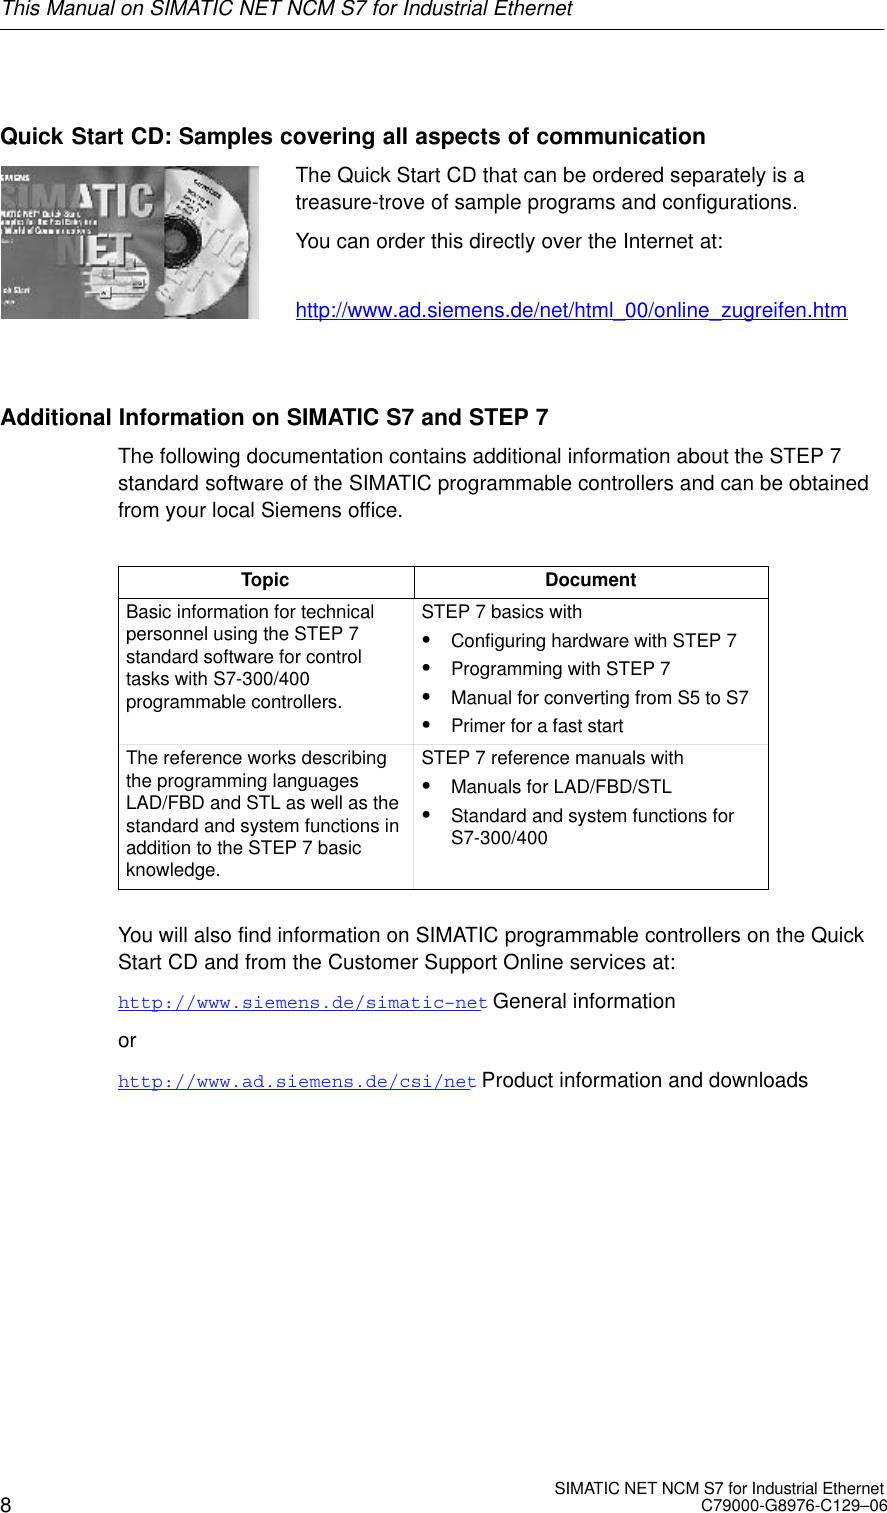 Siemens S7 Users Manual SIMATIC NET